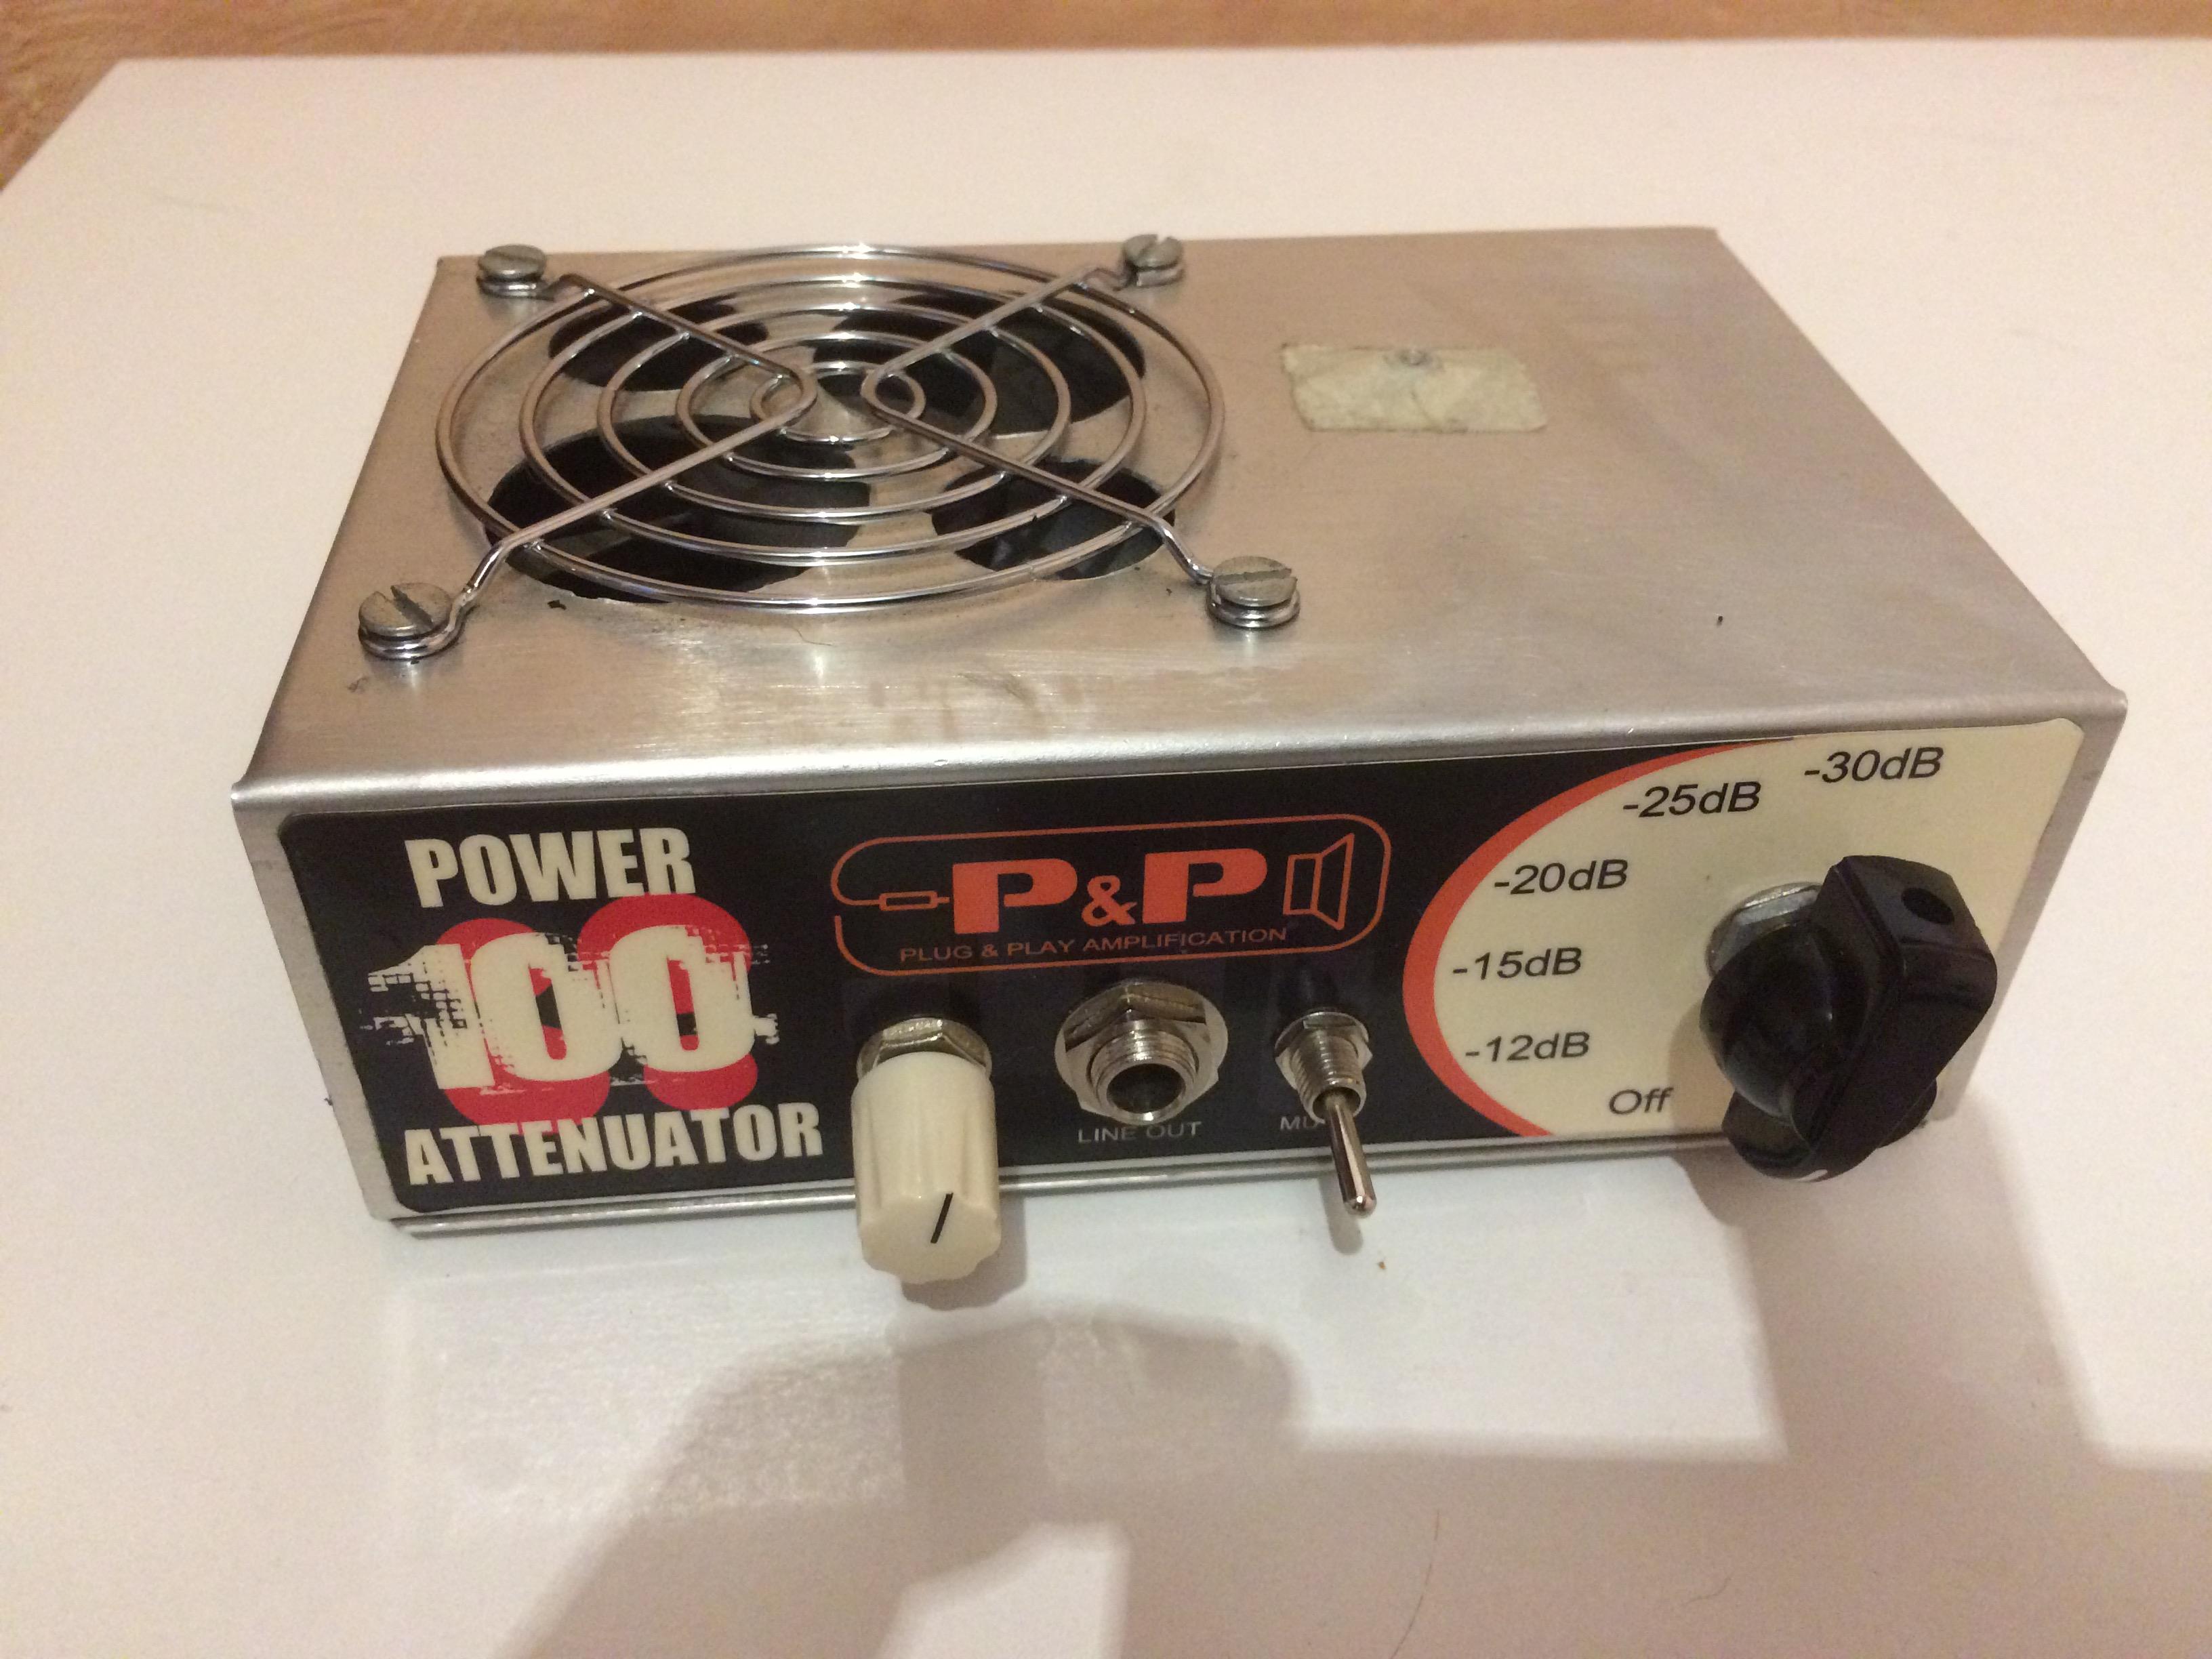 plug play amplification power attenuator 100 image 1817360 audiofanzine. Black Bedroom Furniture Sets. Home Design Ideas